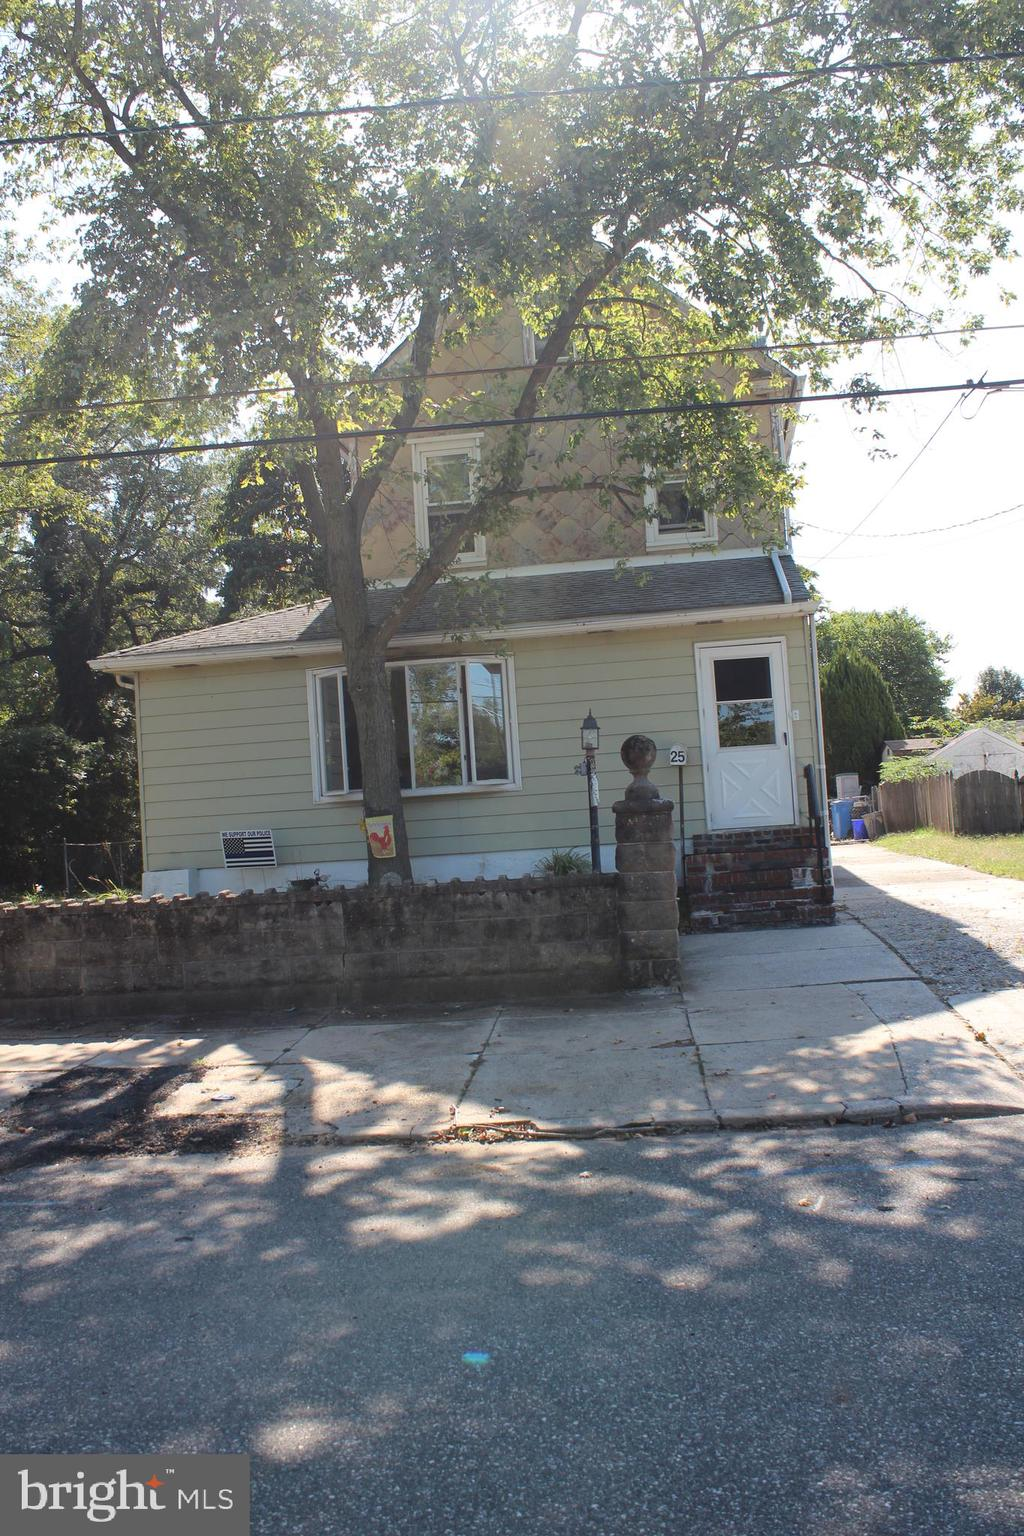 25 DELAWARE VIEW AVENUE, WESTVILLE, NJ 08093